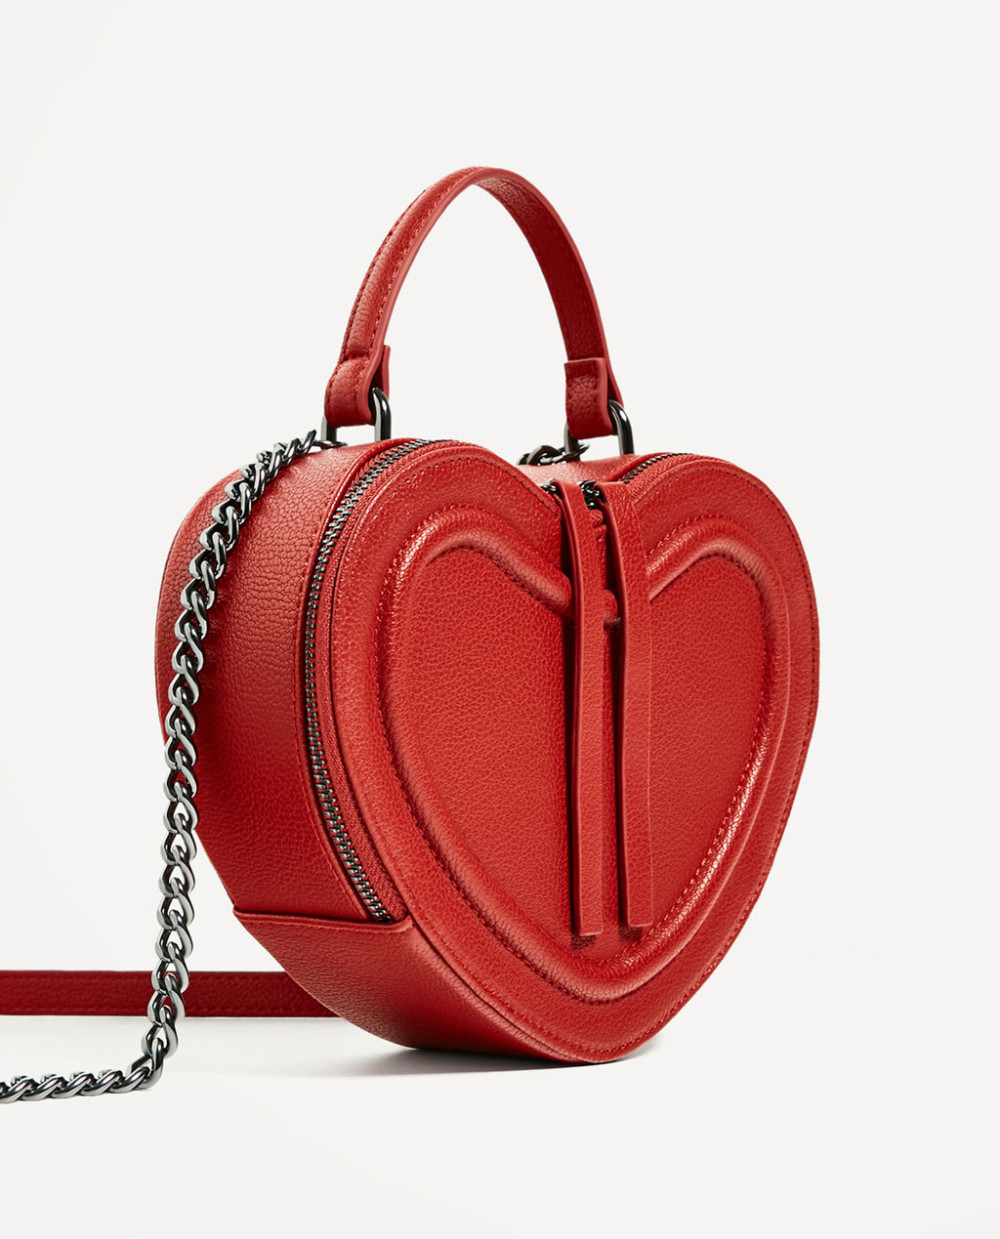 Zara Heart Crossbody Bag